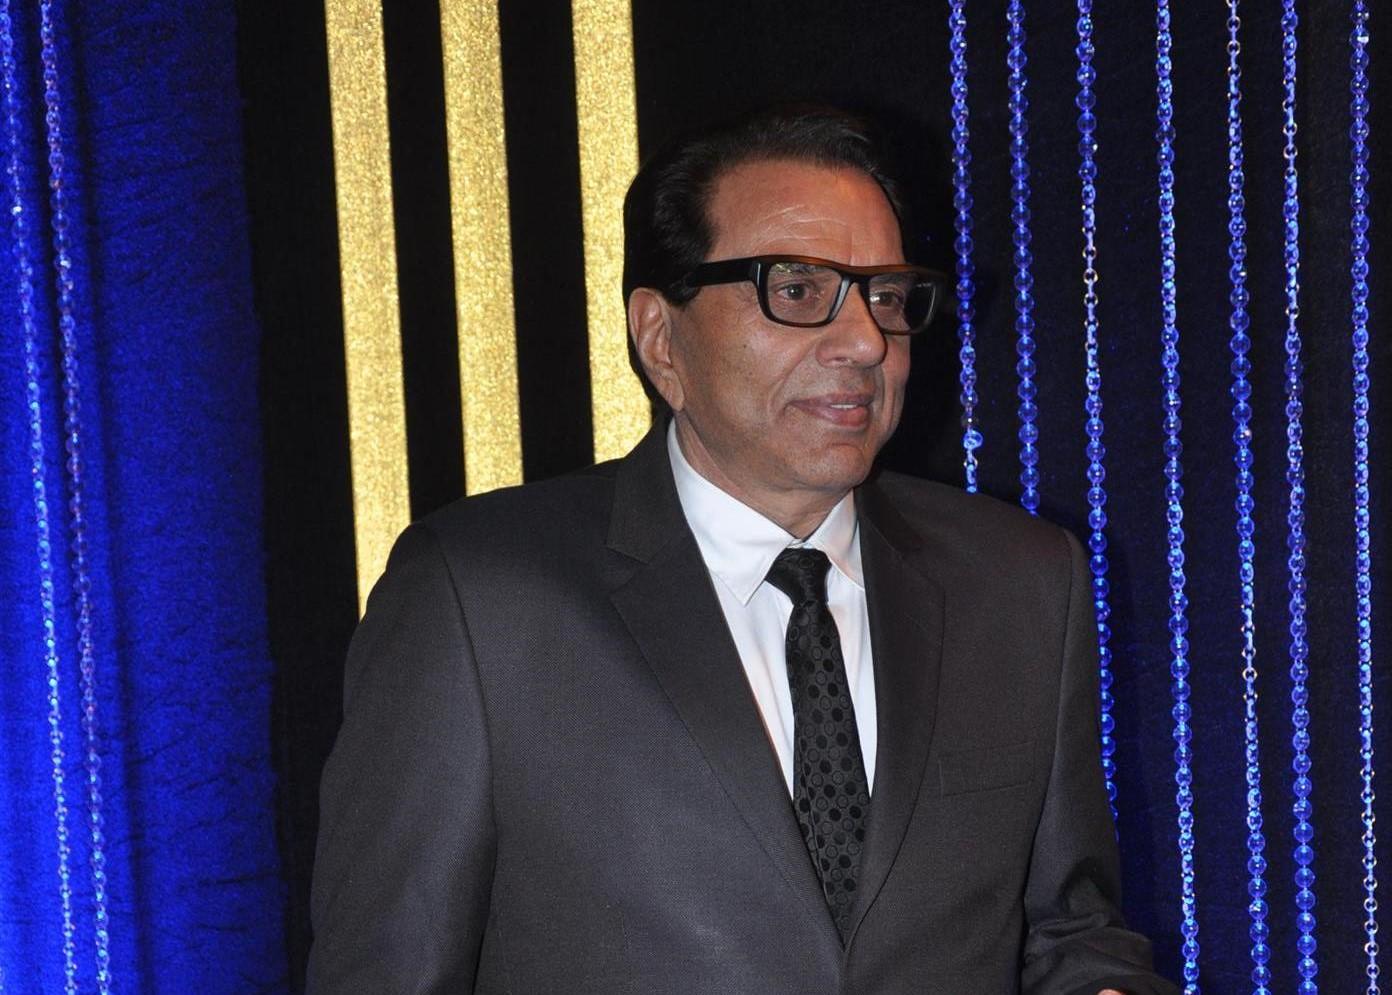 Bollywood actor Dharmendra during the 64th birthday celebrations of actor Rakesh Roshan in Mumbai